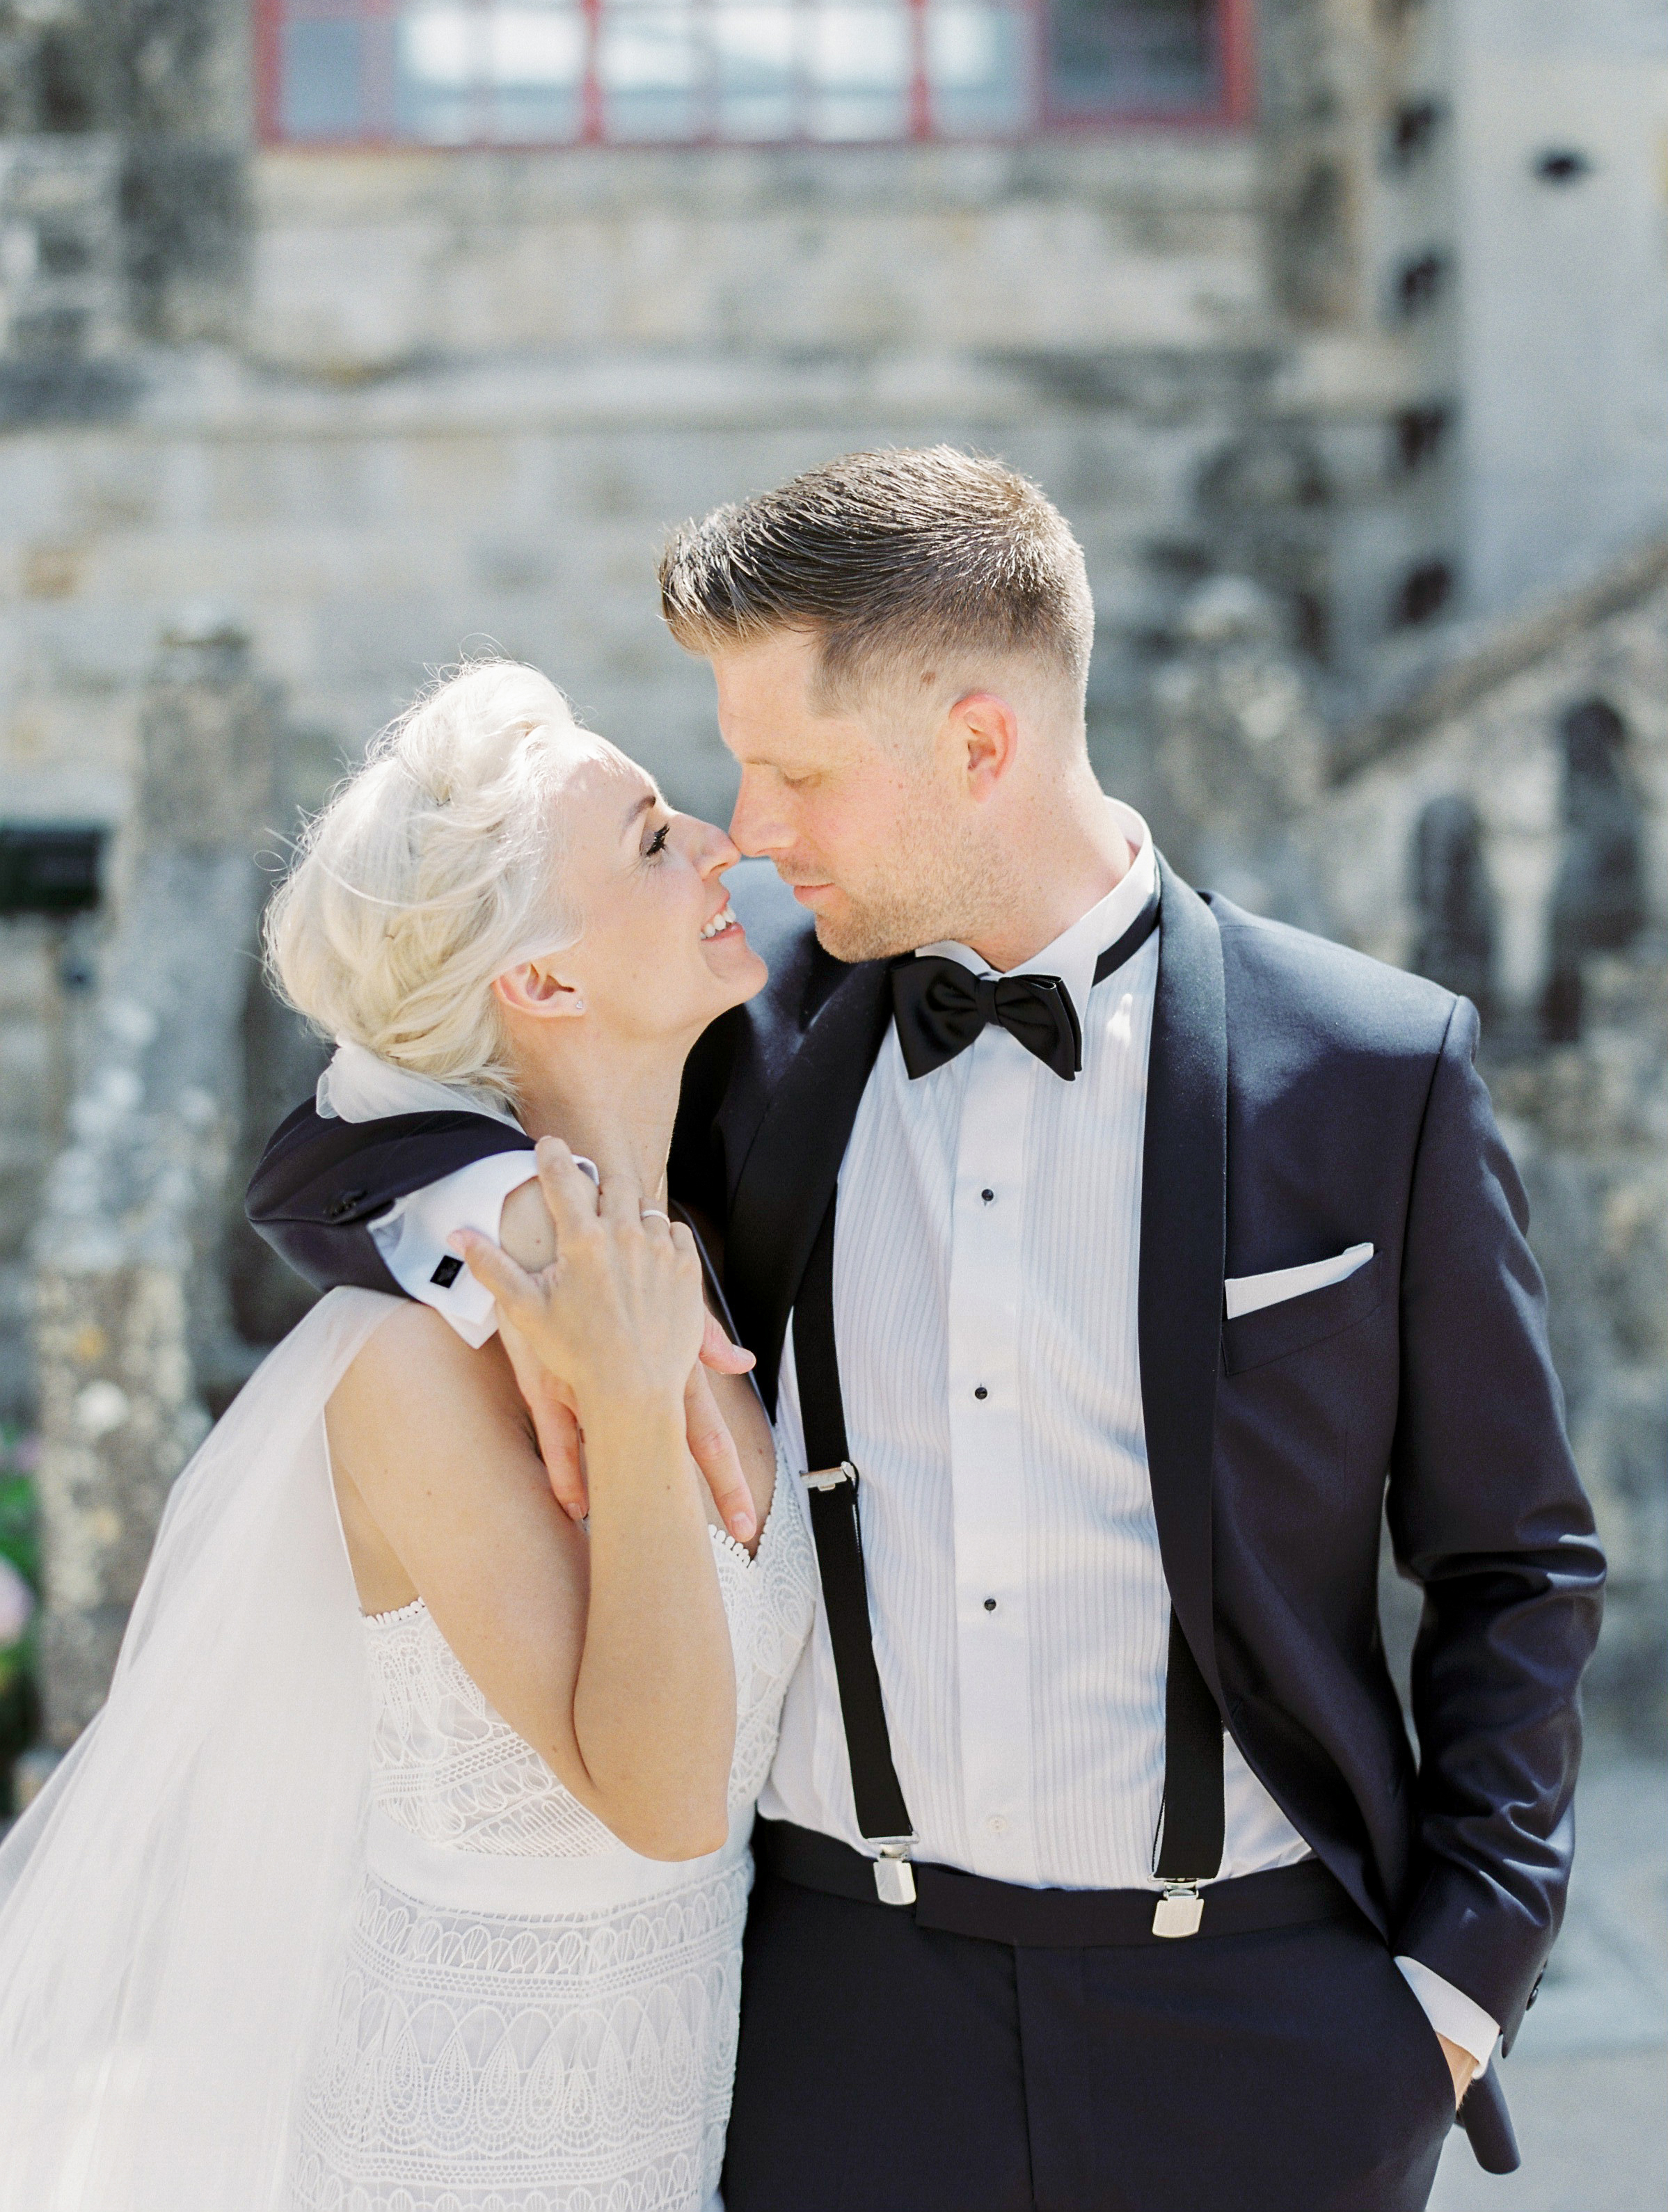 Nastia_Vesna_Photography_Wedding_Portugal_34.jpg